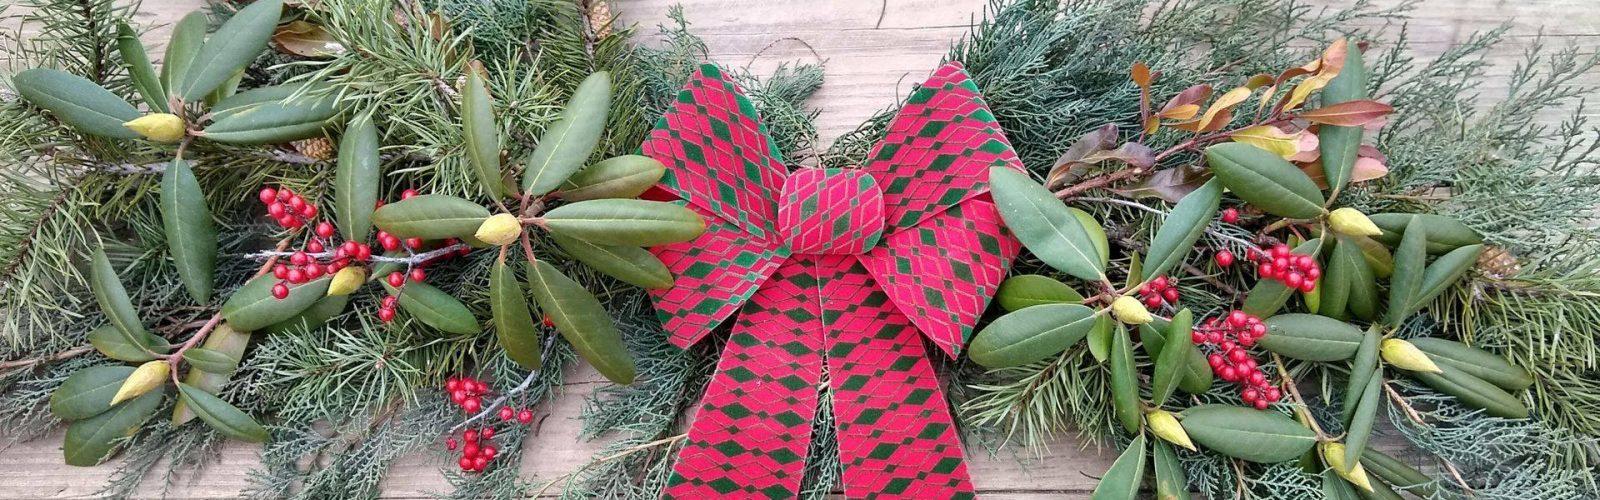 Native Evergreen Arrangements Available